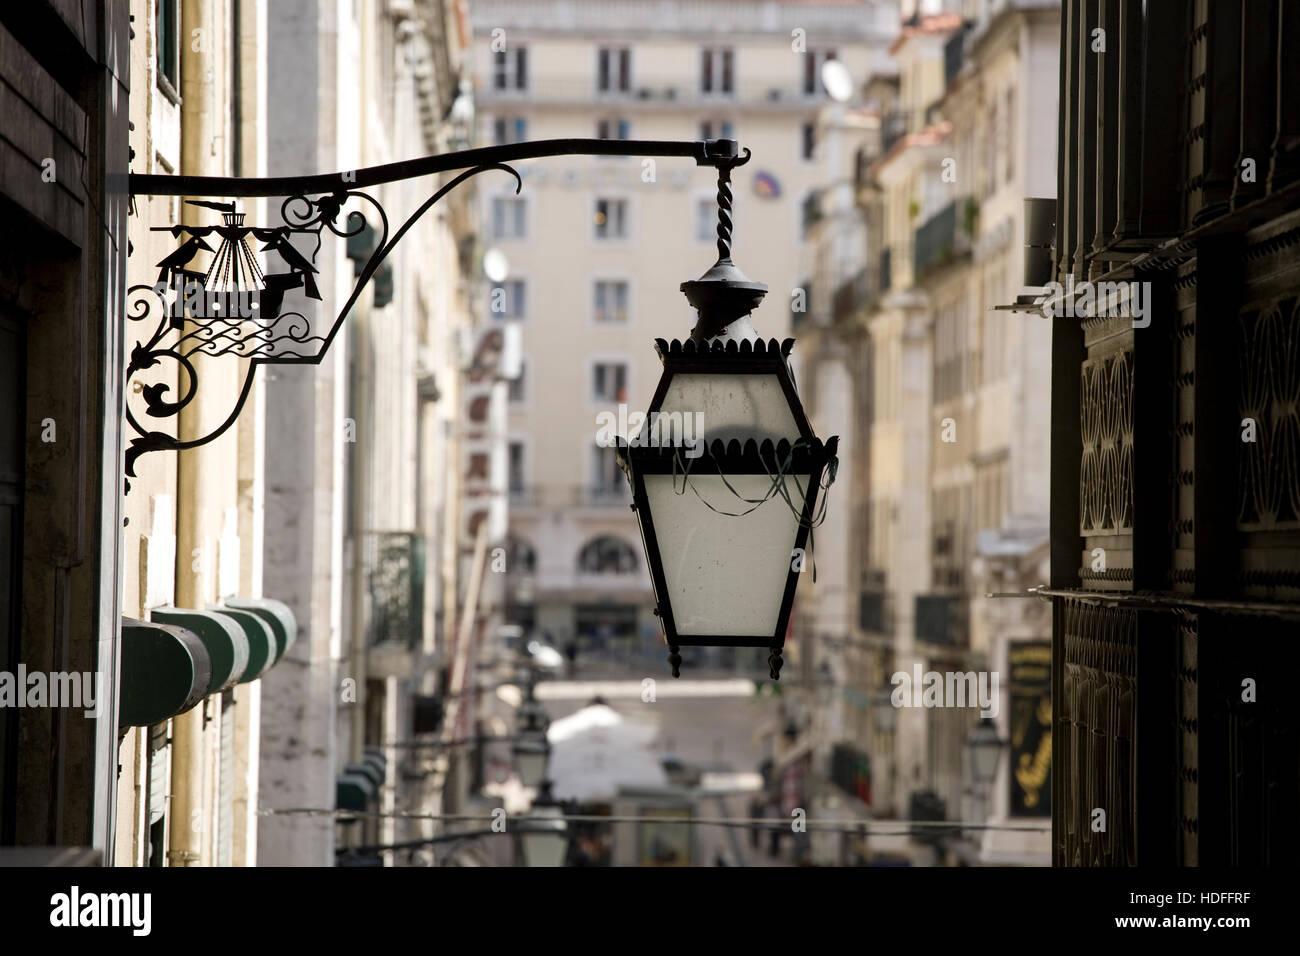 Typical streetlamp, Baixa, Lisbon, Portugal, Europe - Stock Image